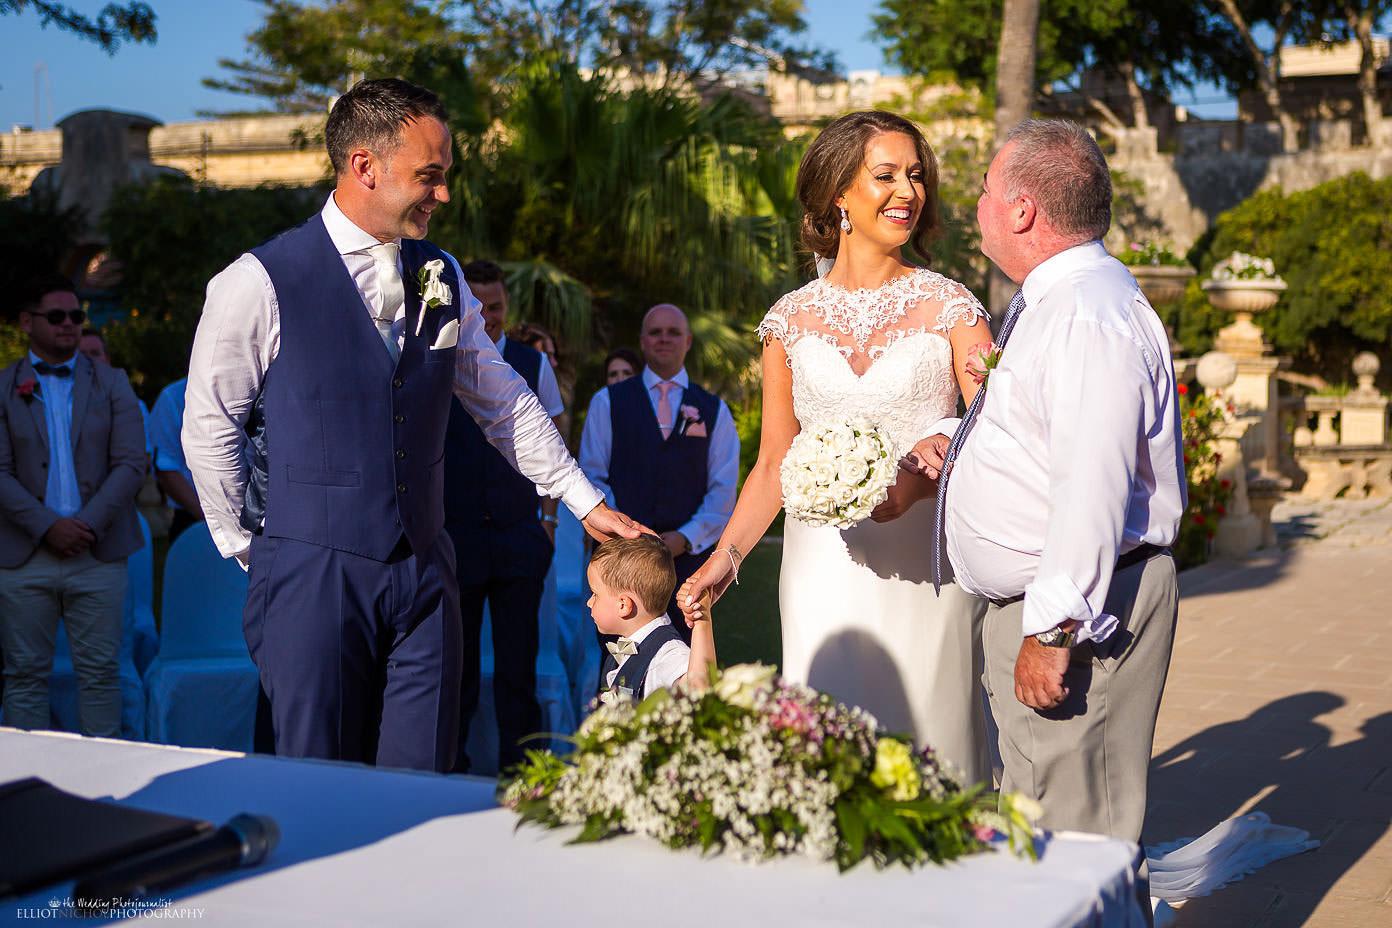 Bride meets her groom at their destination wedding ceremony in Malta.